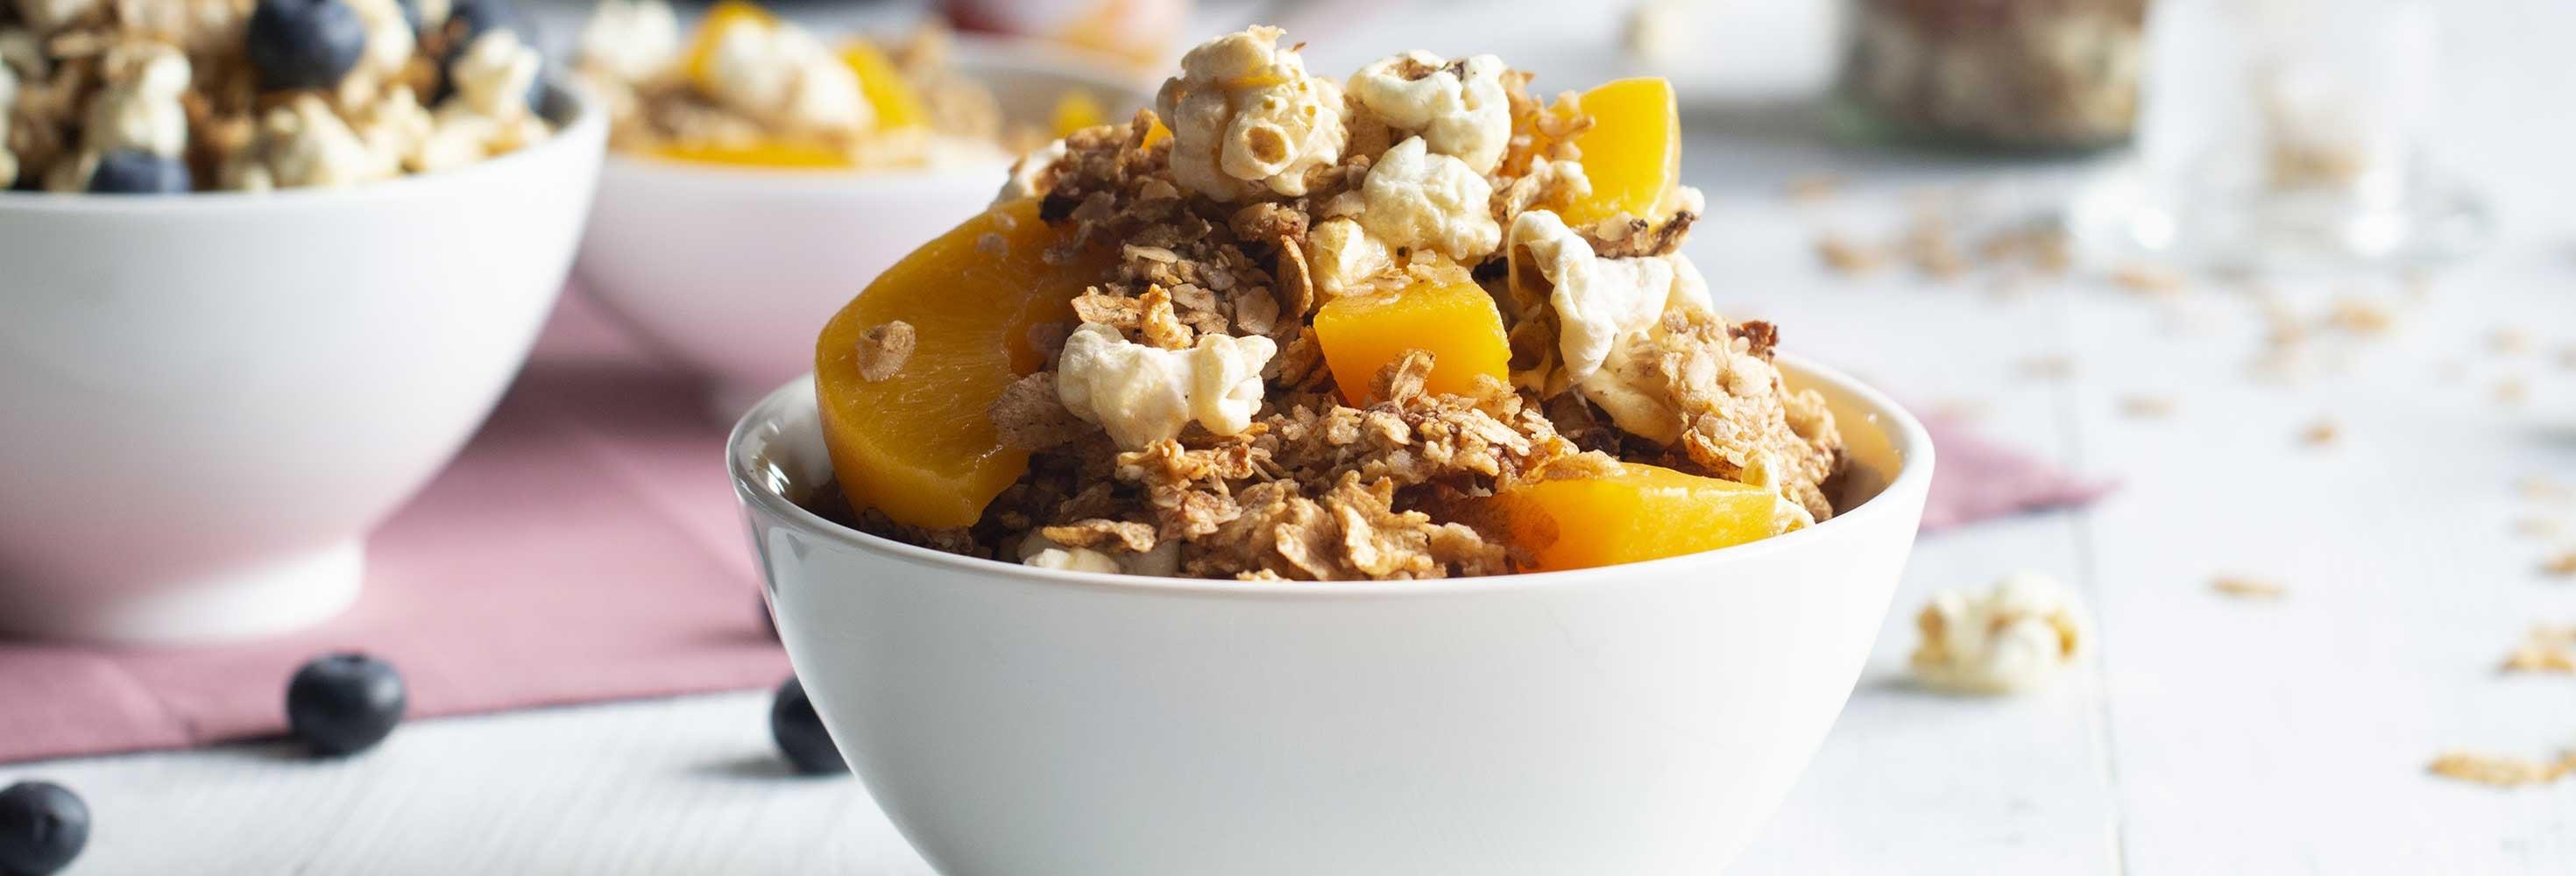 Yoghurtbowl met fruit & granola